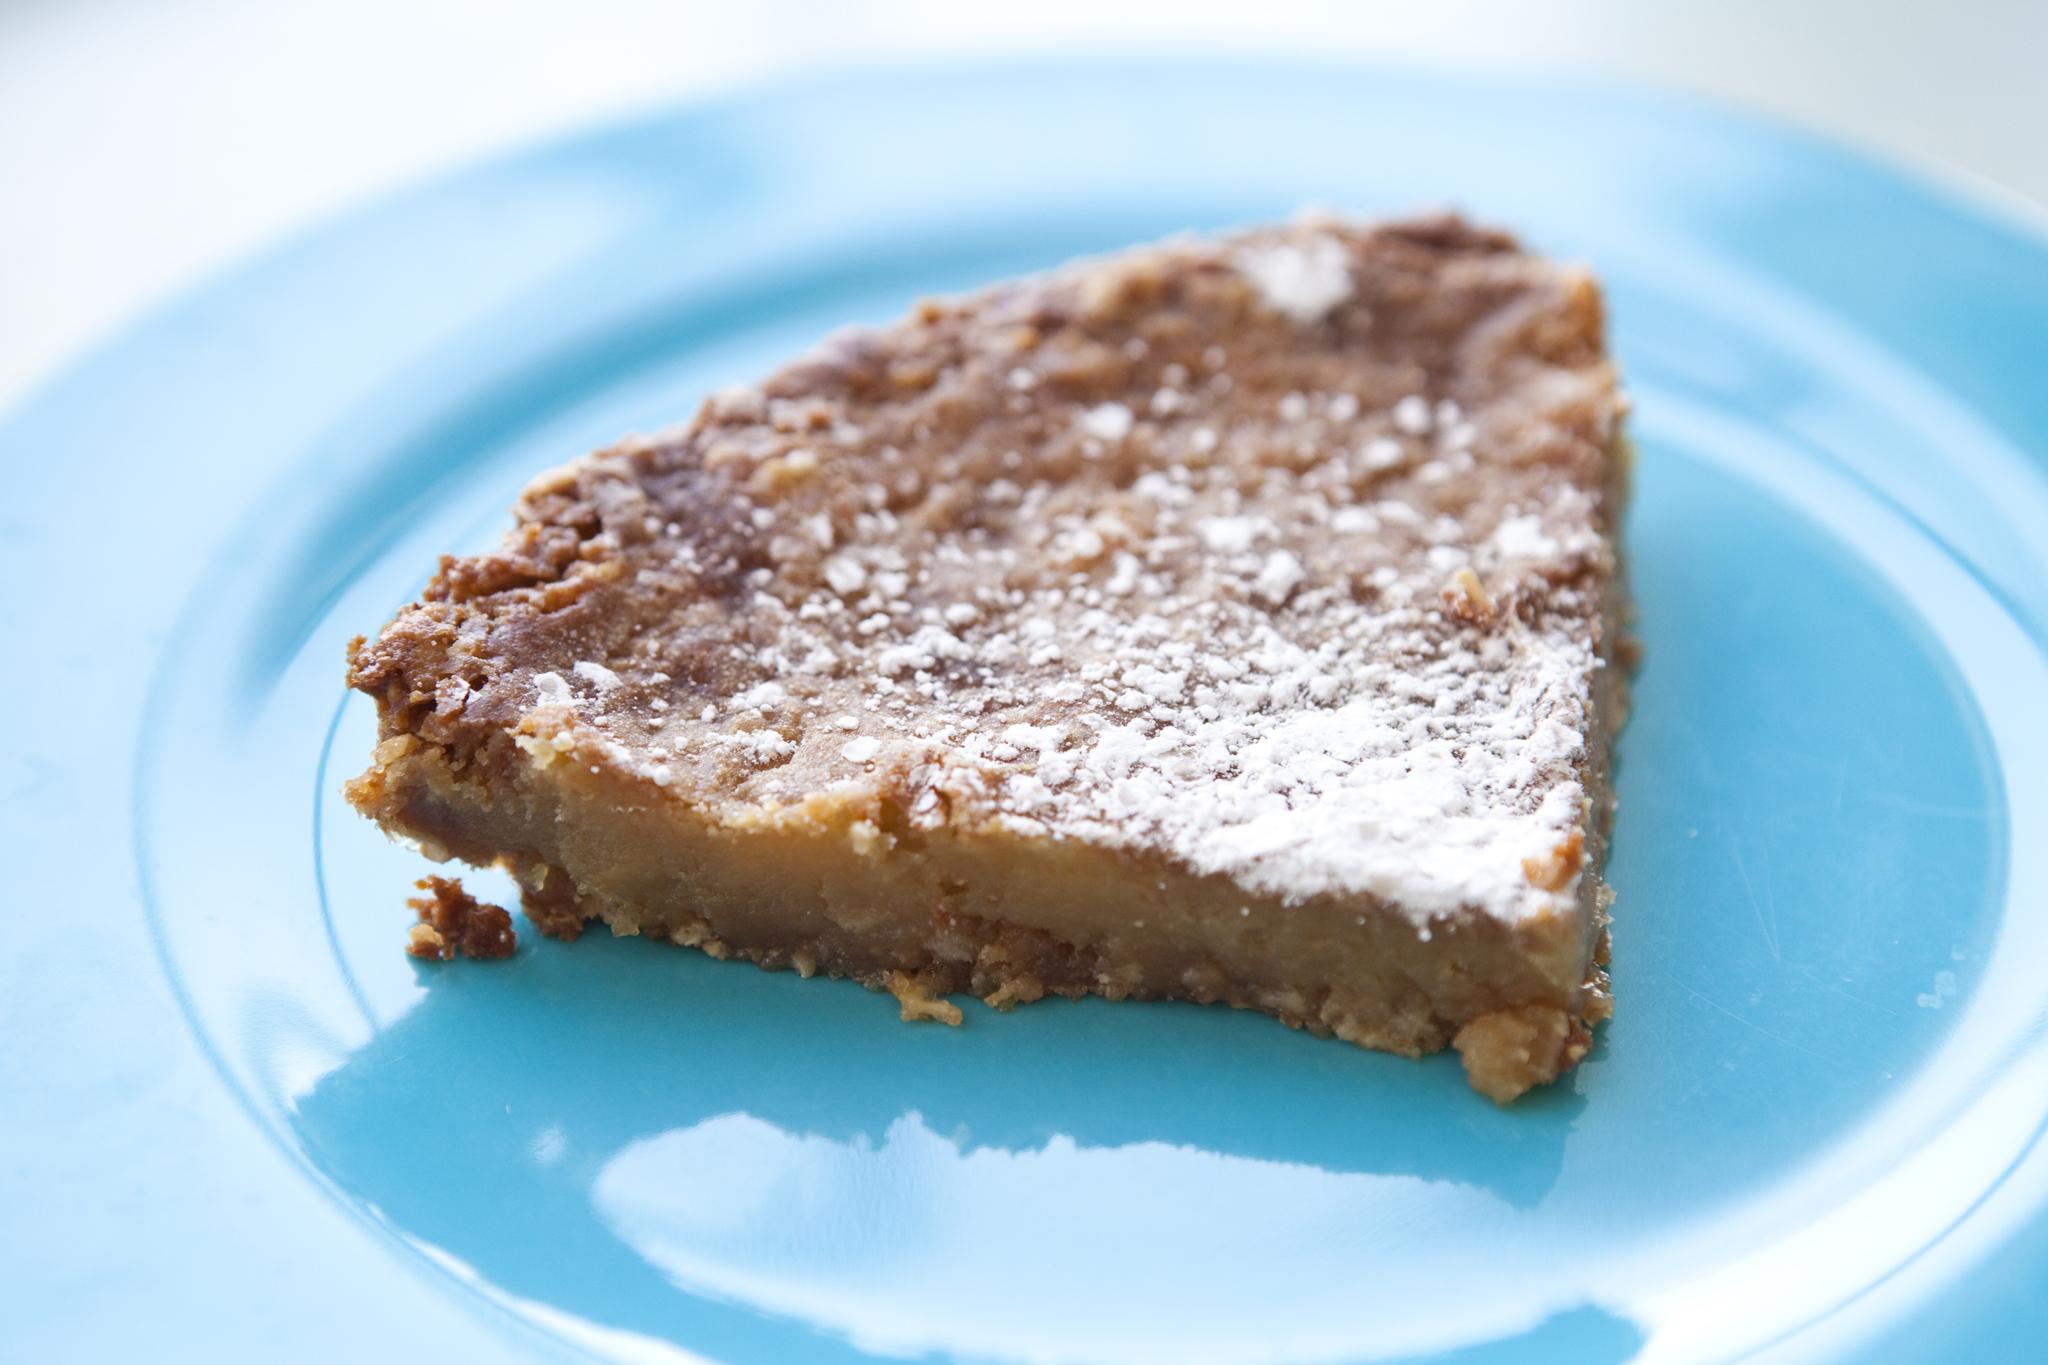 Crack Pie from Milkbar